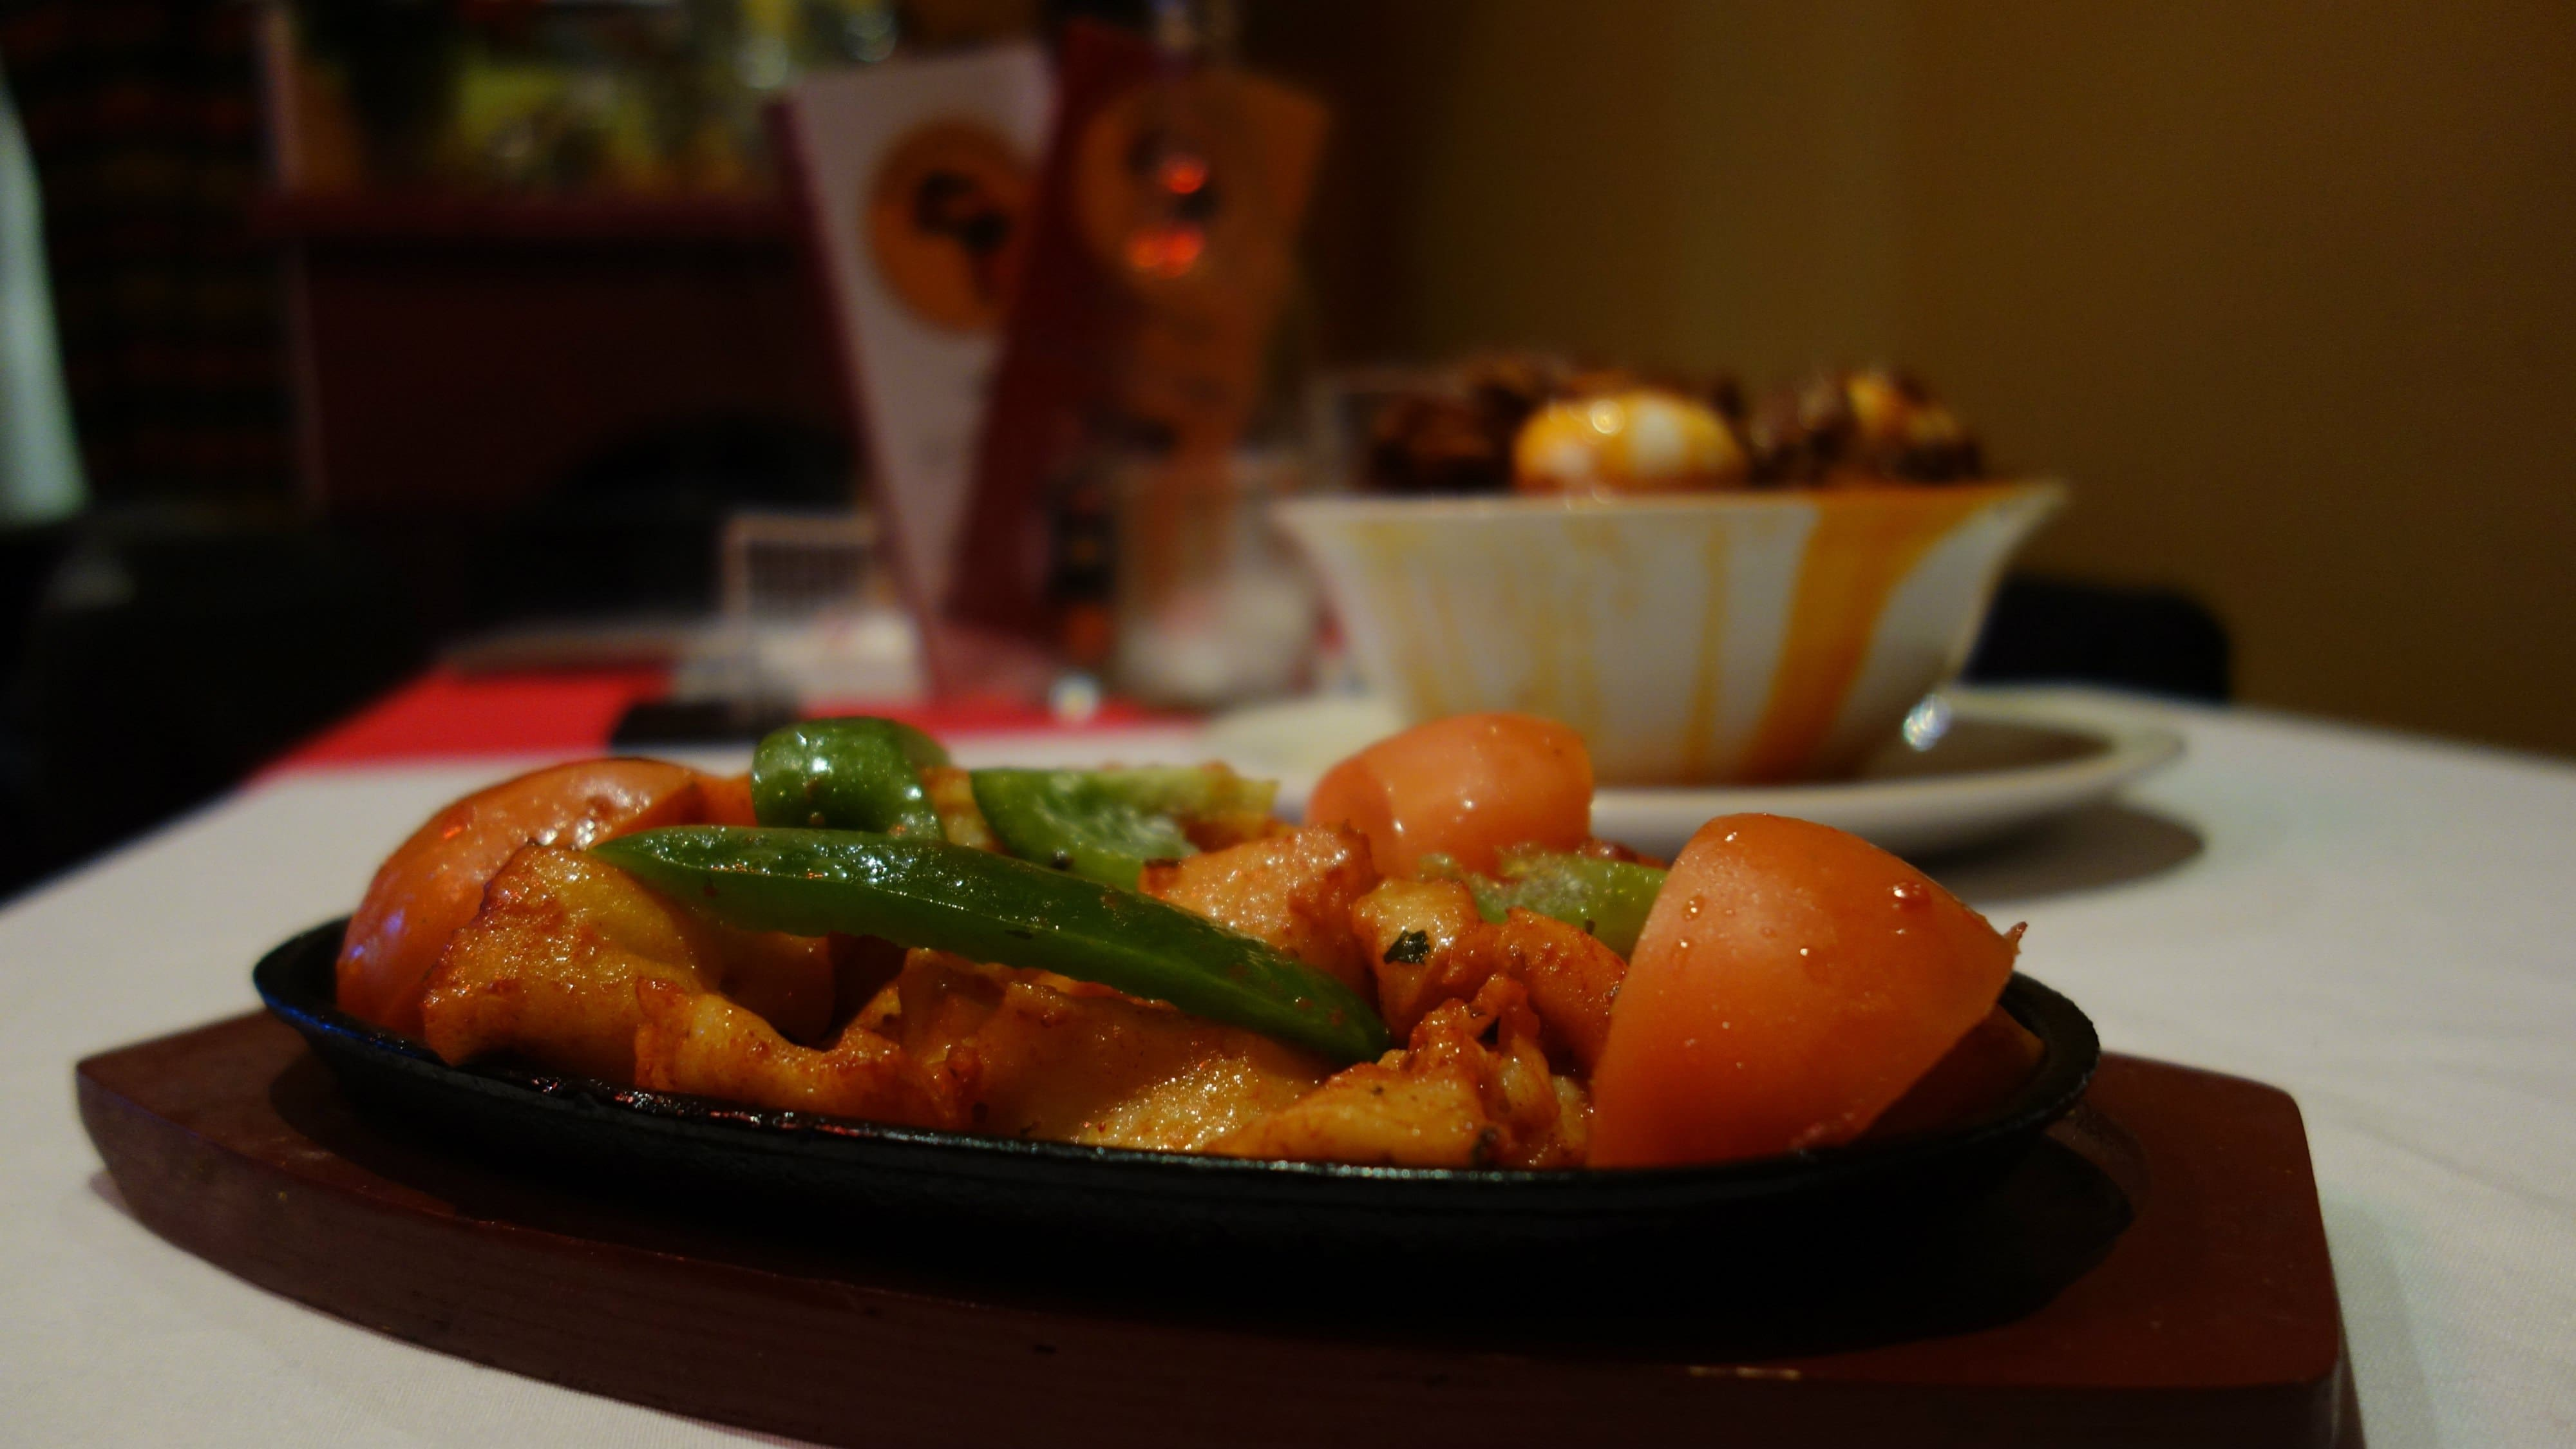 Savanna African Restaurant And Cafe | 7 JOHNSTON Street, Collingwood, Victoria 3066 | +61 3 9416 1462